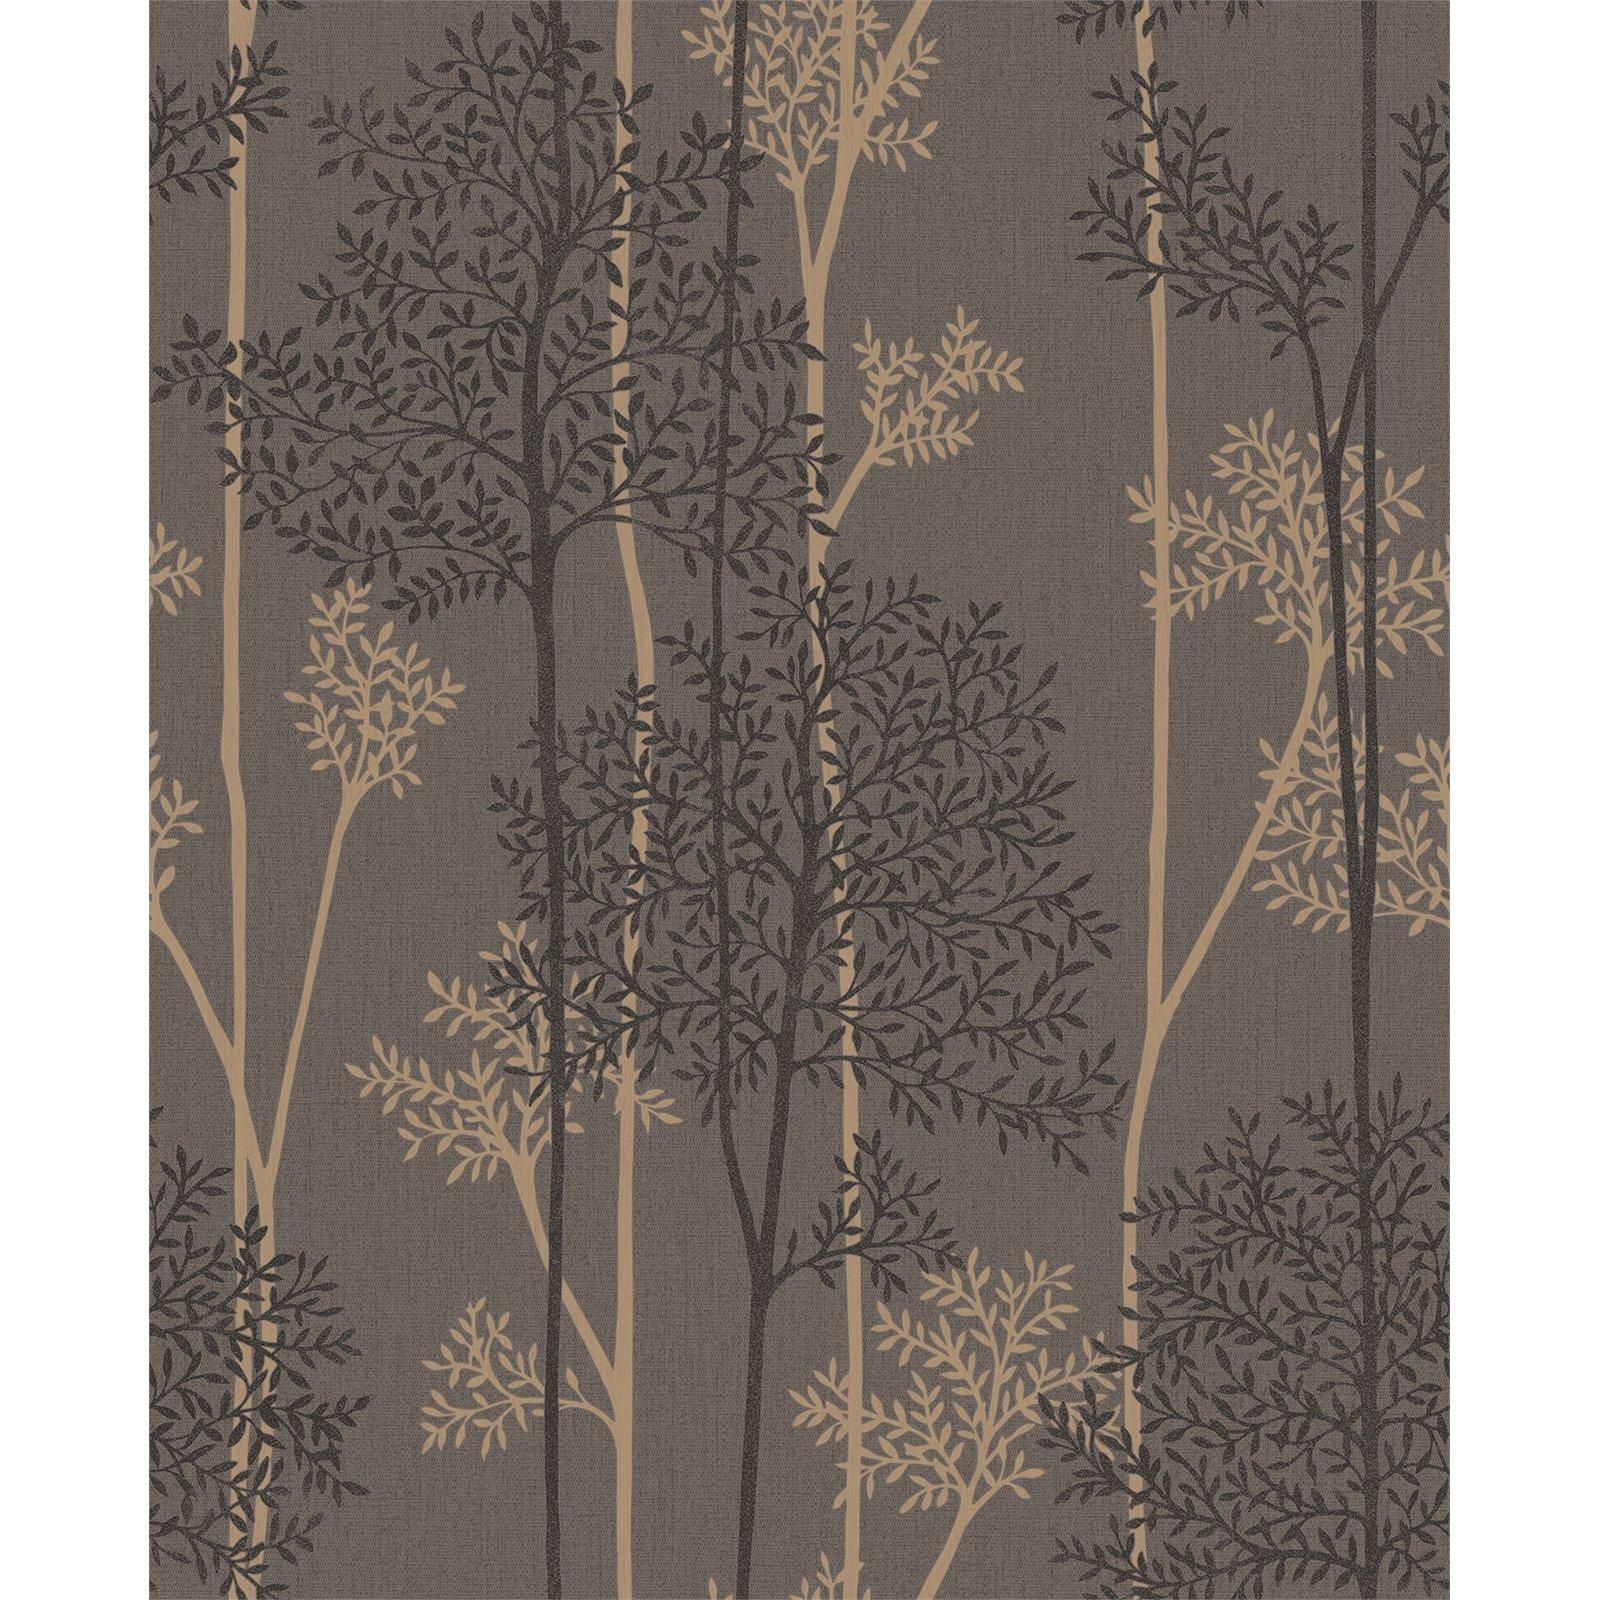 Superfresco Easy 52cm x 10m Chocolate / Bronze Eternal Wallpaper